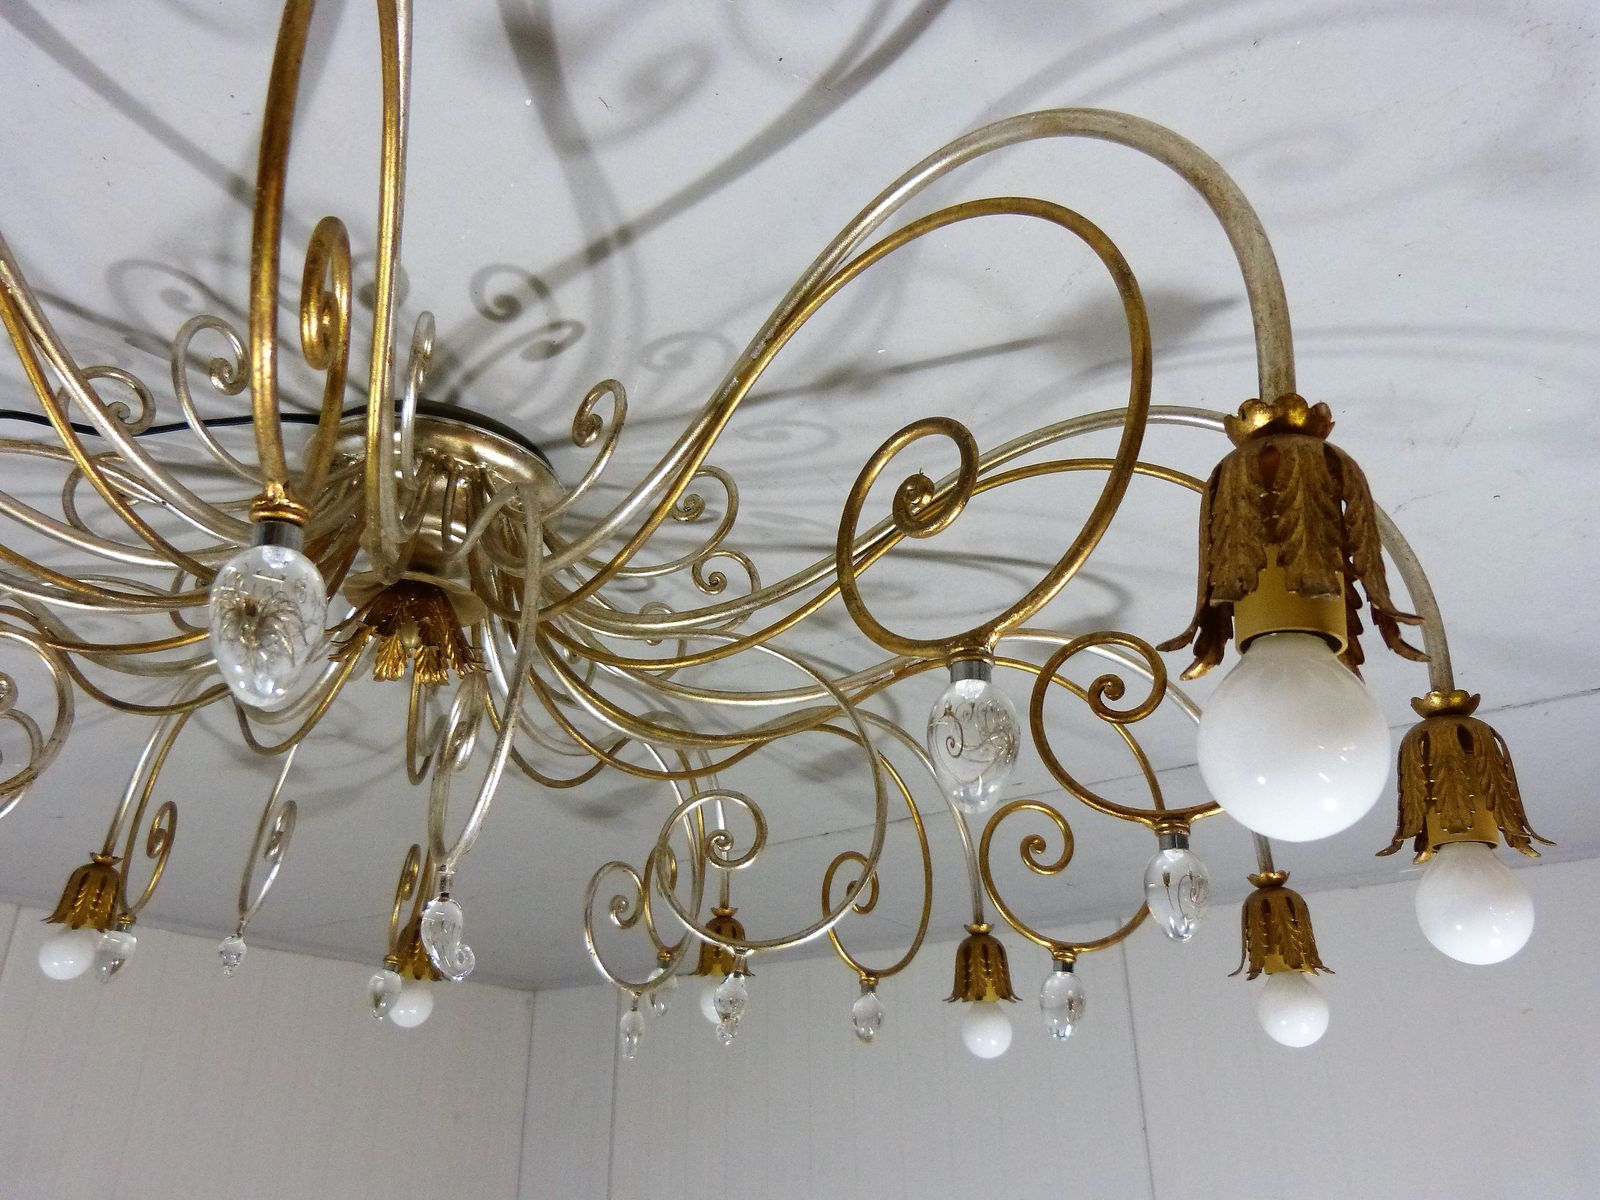 gro er italienischer vintage kronleuchter im hollywood regency stil bei pamono kaufen. Black Bedroom Furniture Sets. Home Design Ideas